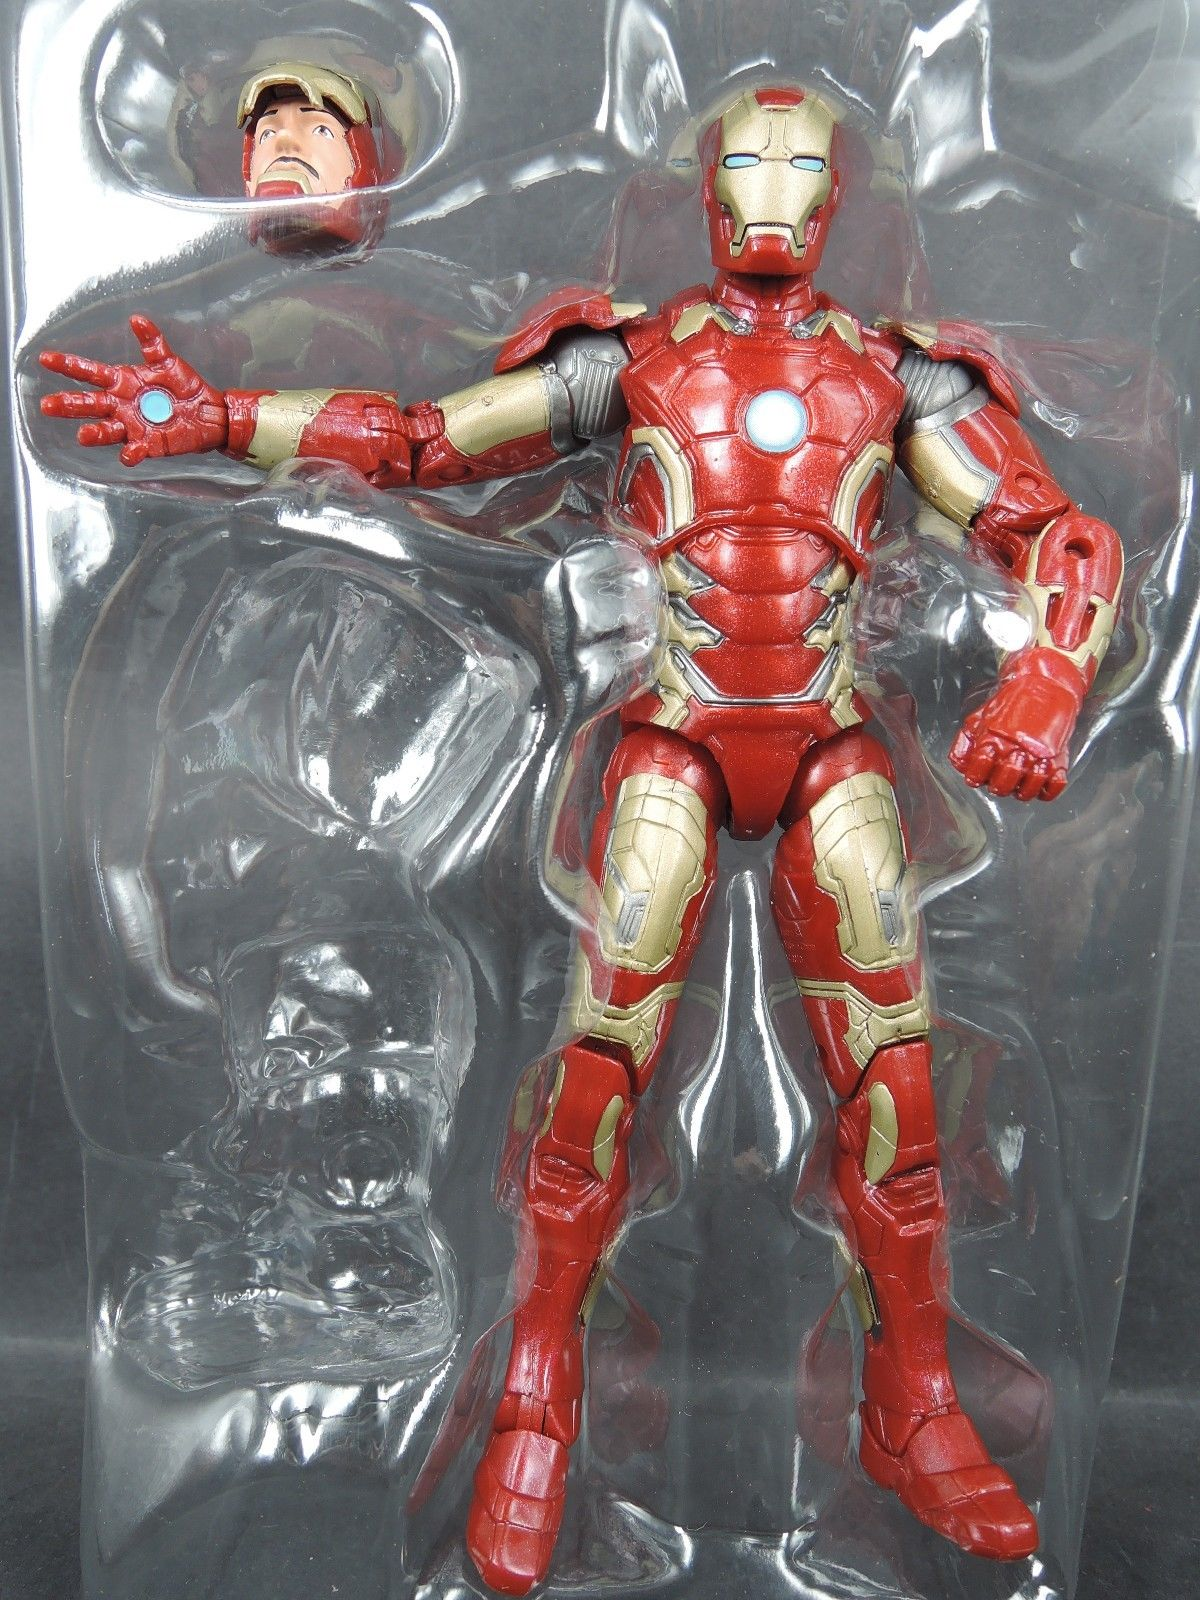 The Avengers Age of Ultron Iron Man Mark 43 Ultron Iron Man Mark 43 1